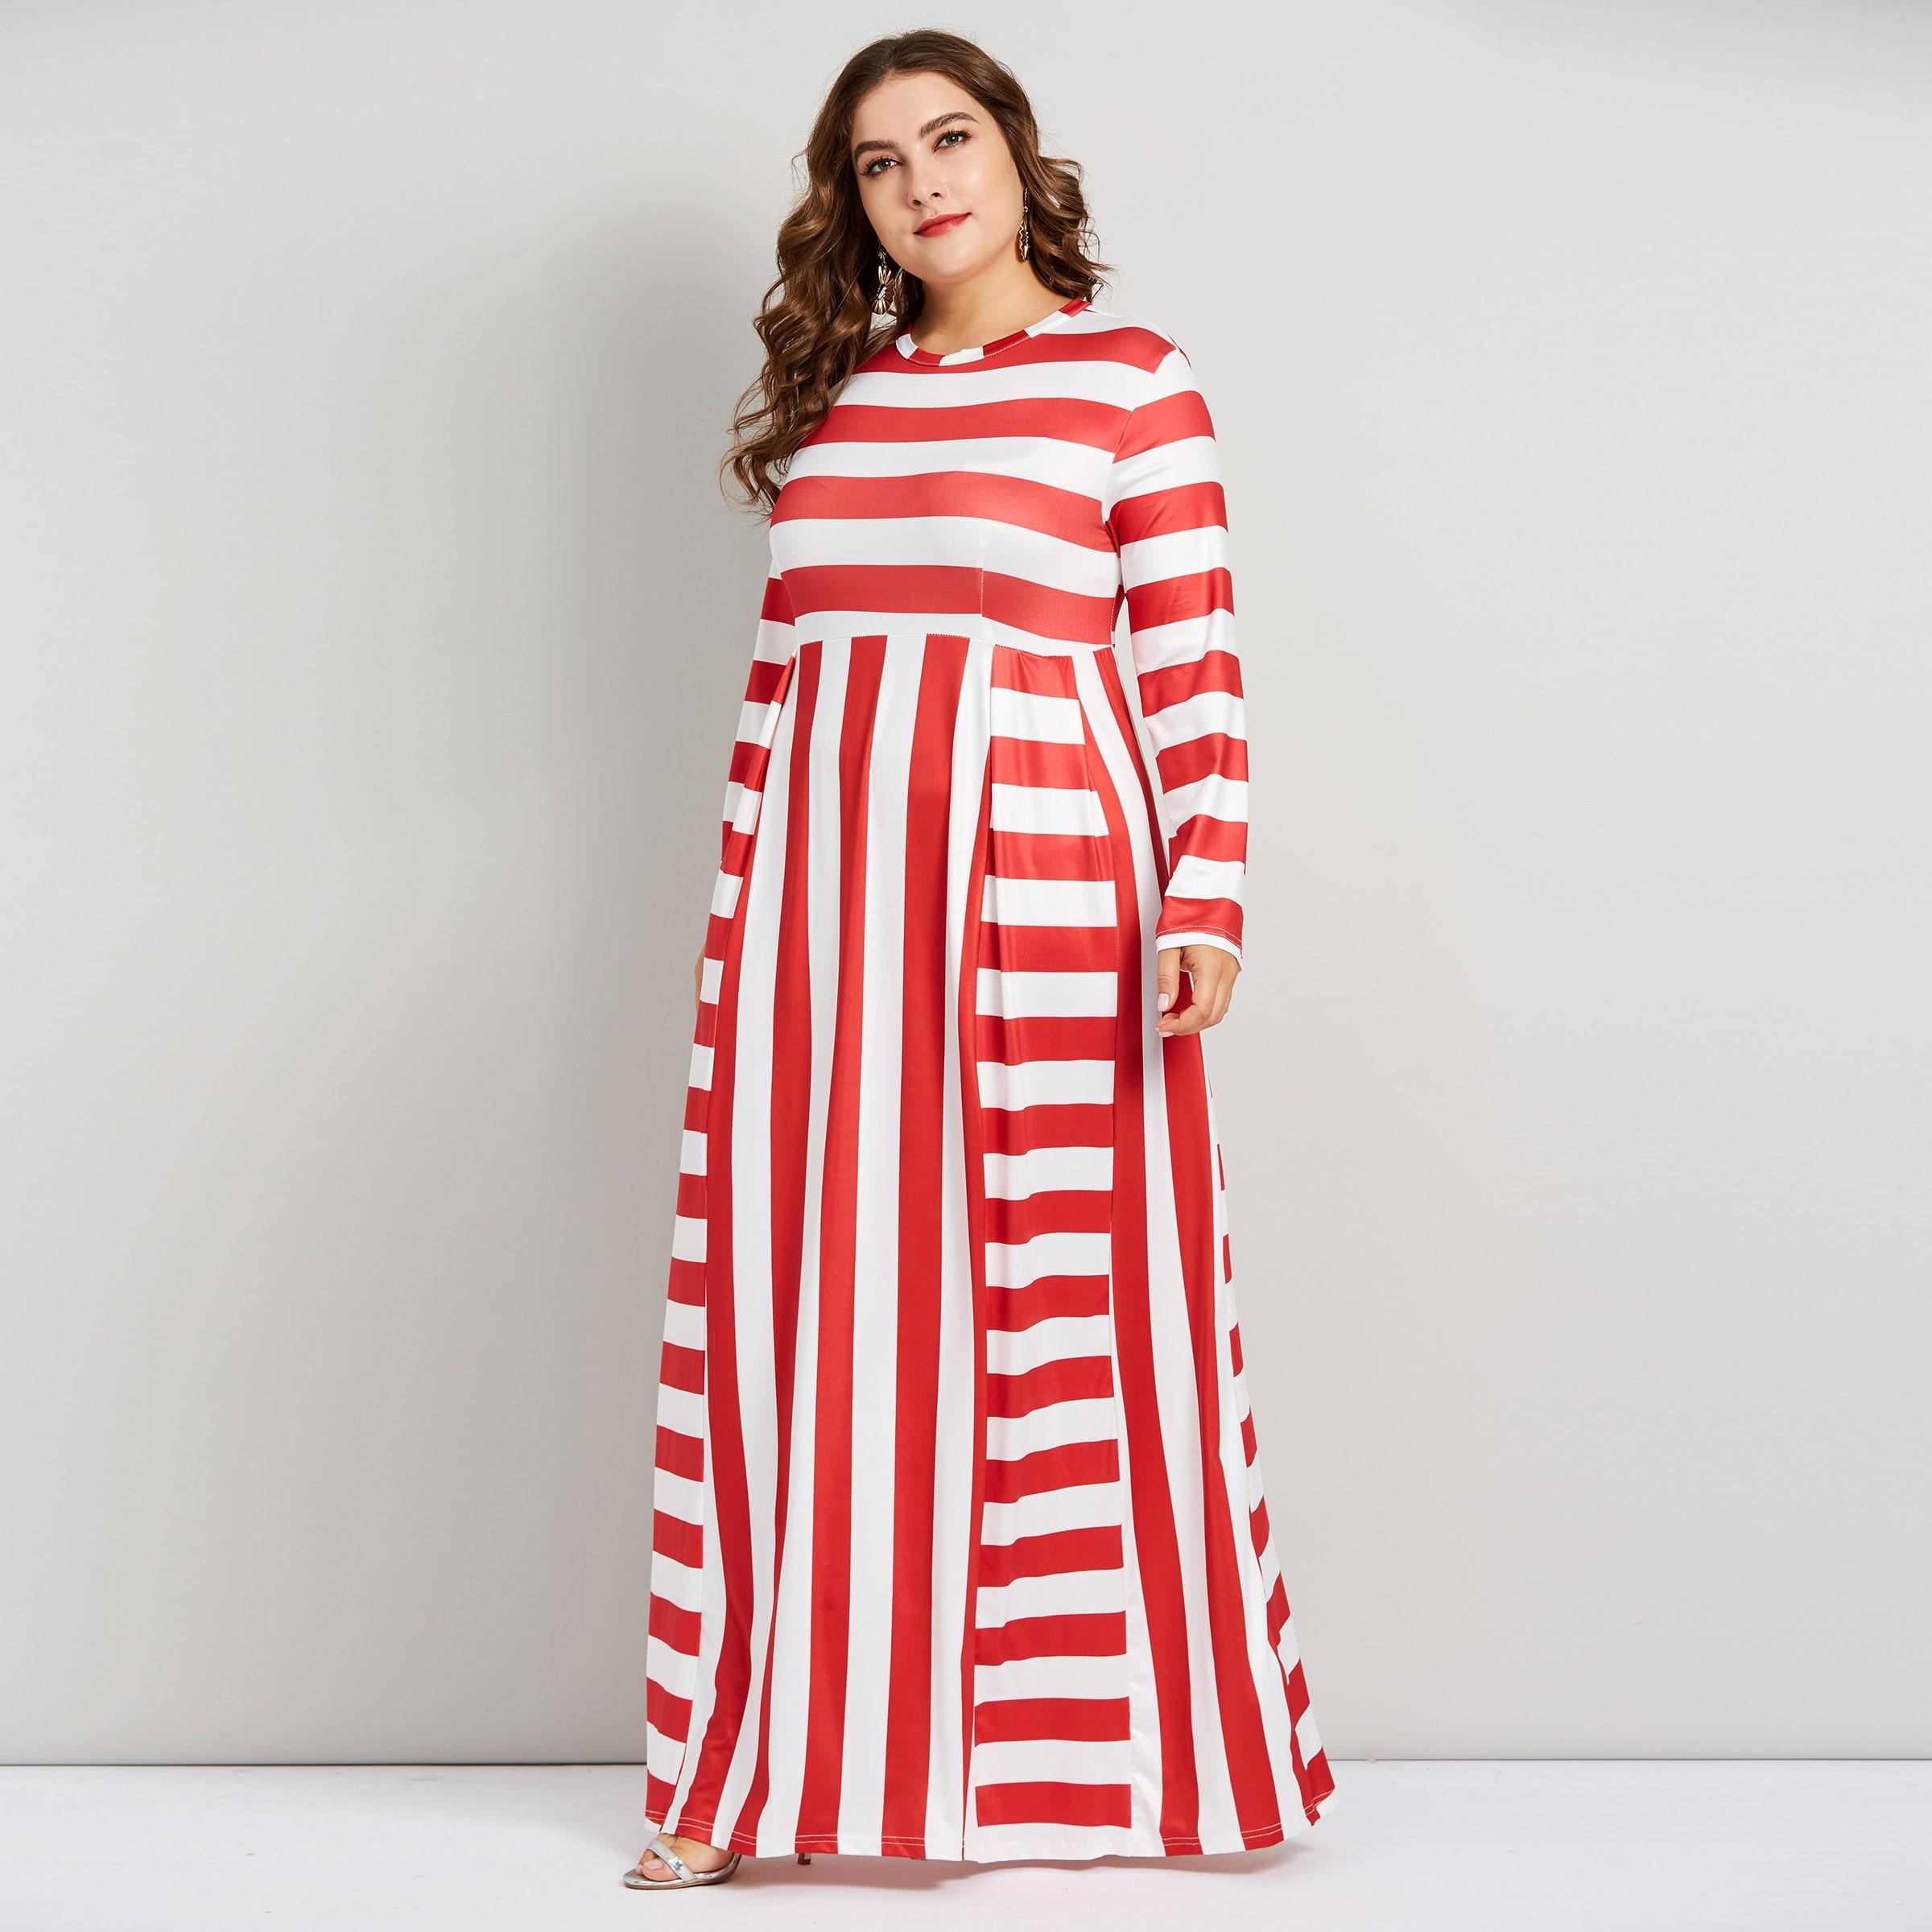 a51490191f Plusee Autumn Winter Women Maxi Dress Elegant Red White Stripe Plus Size  5XL Stylish Party Floor Length Swing Long Dress Female